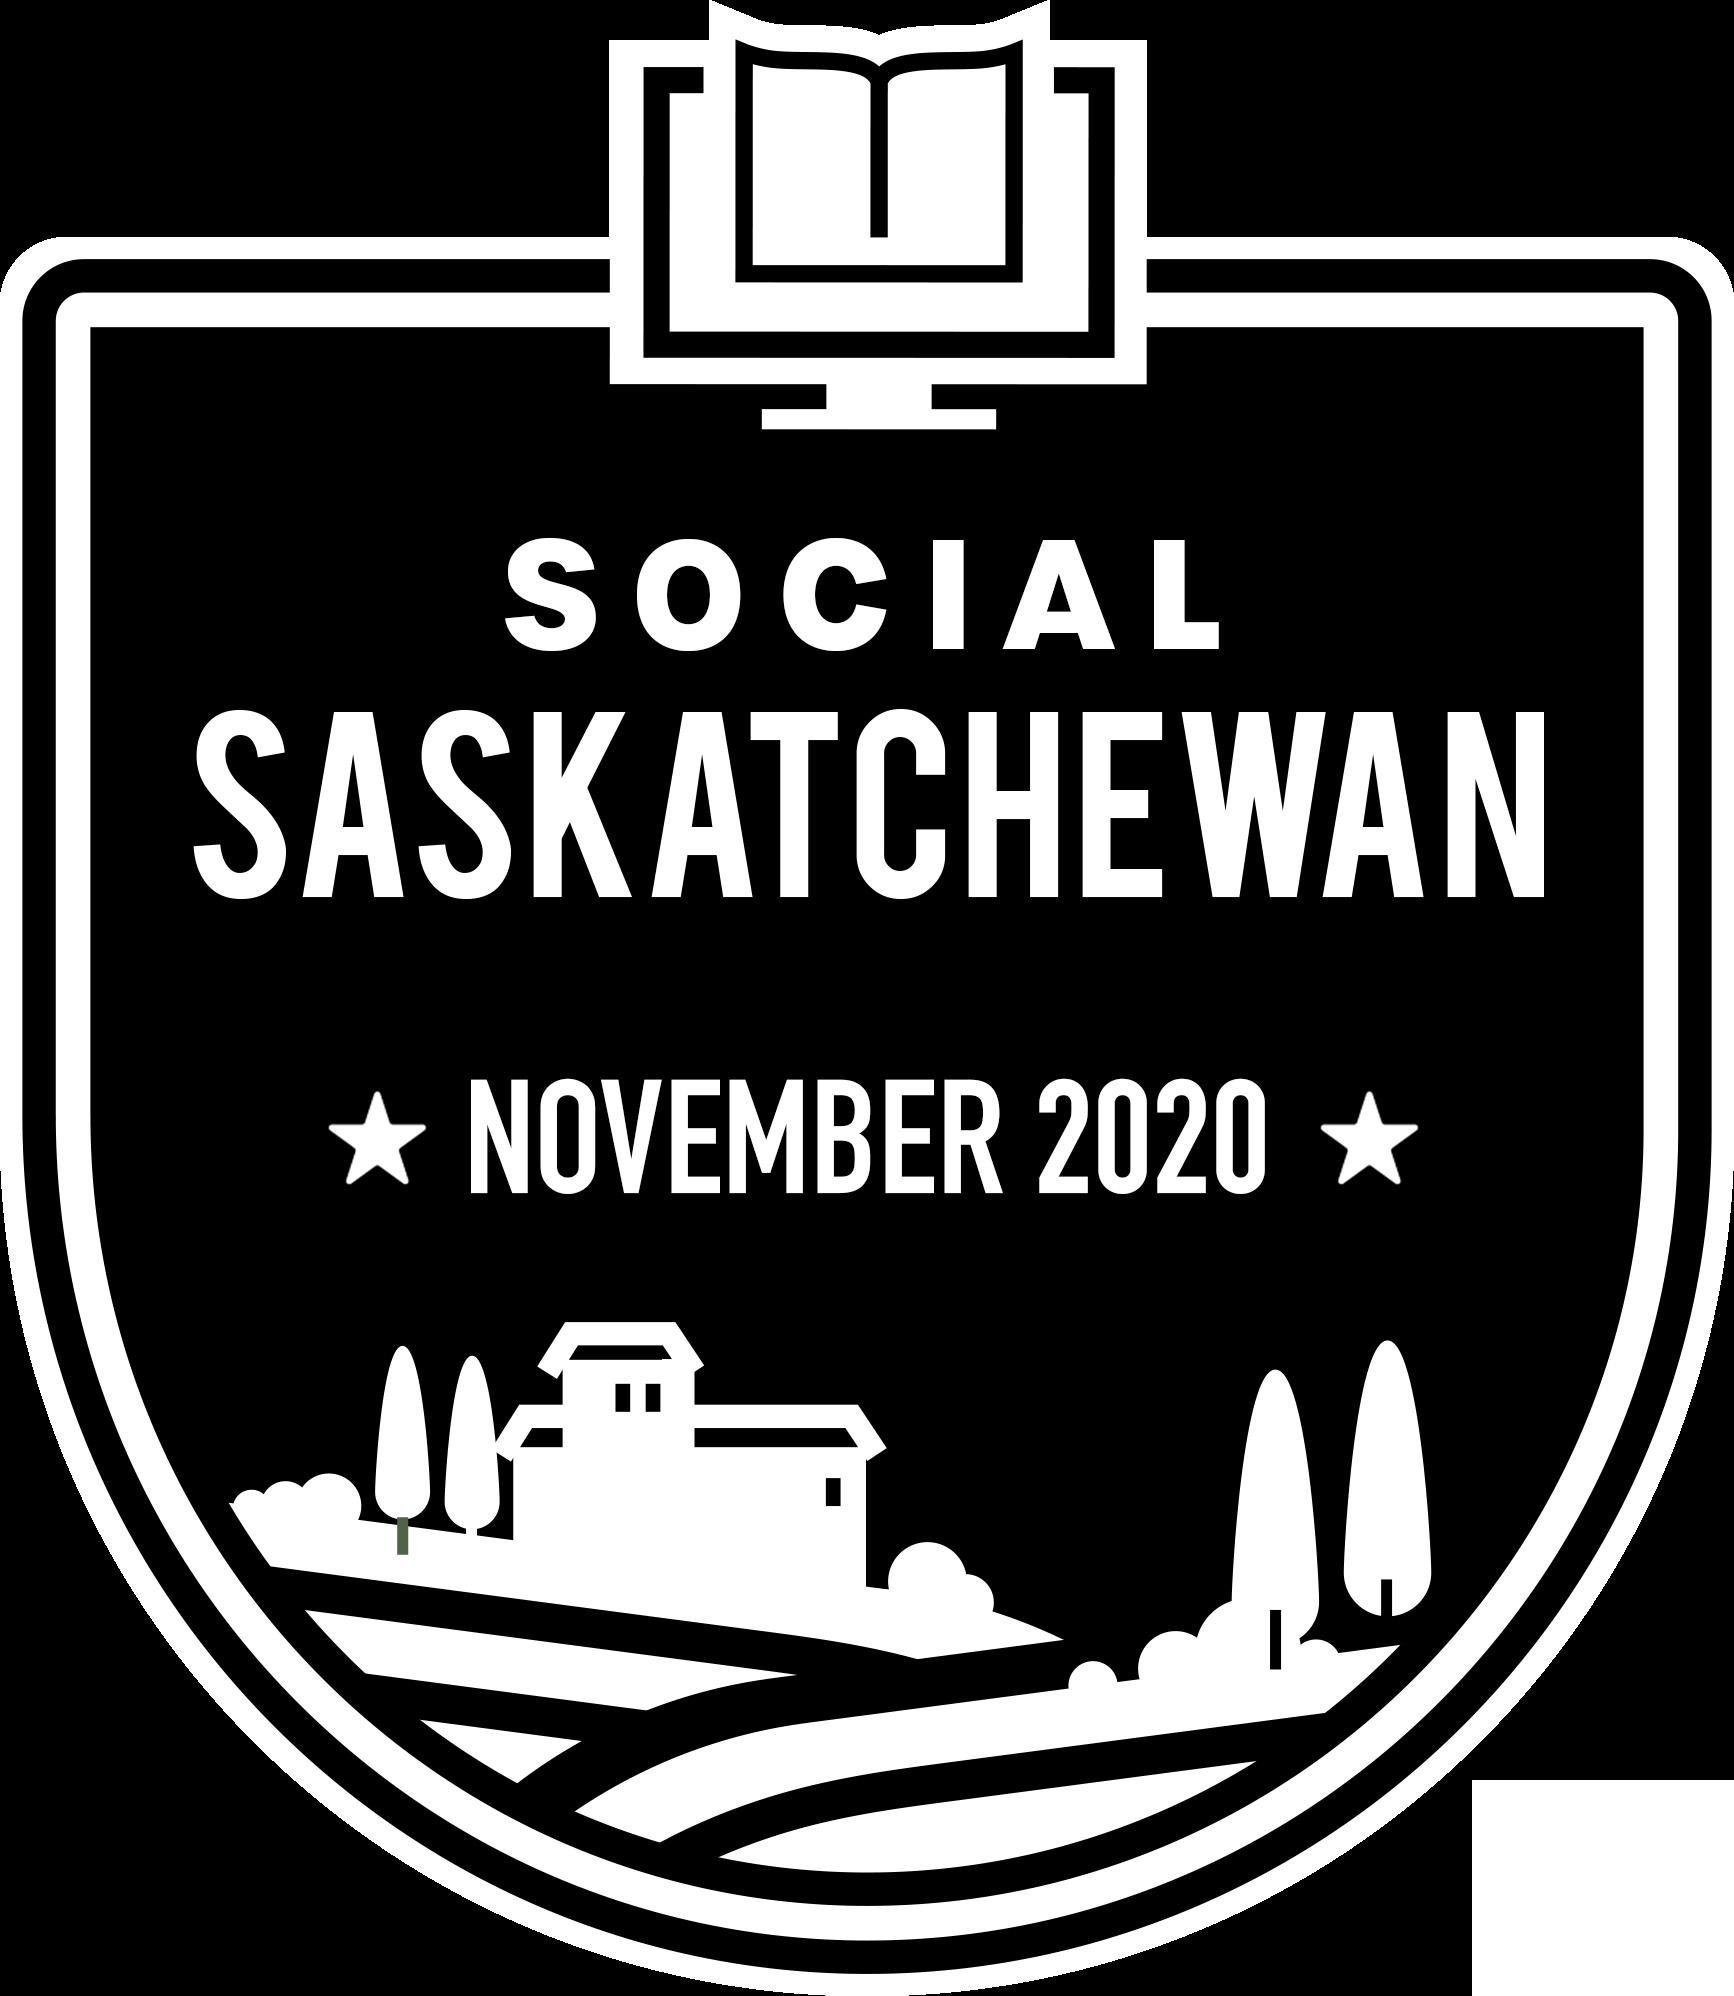 Social Saskatchewan - Nov 2020.png